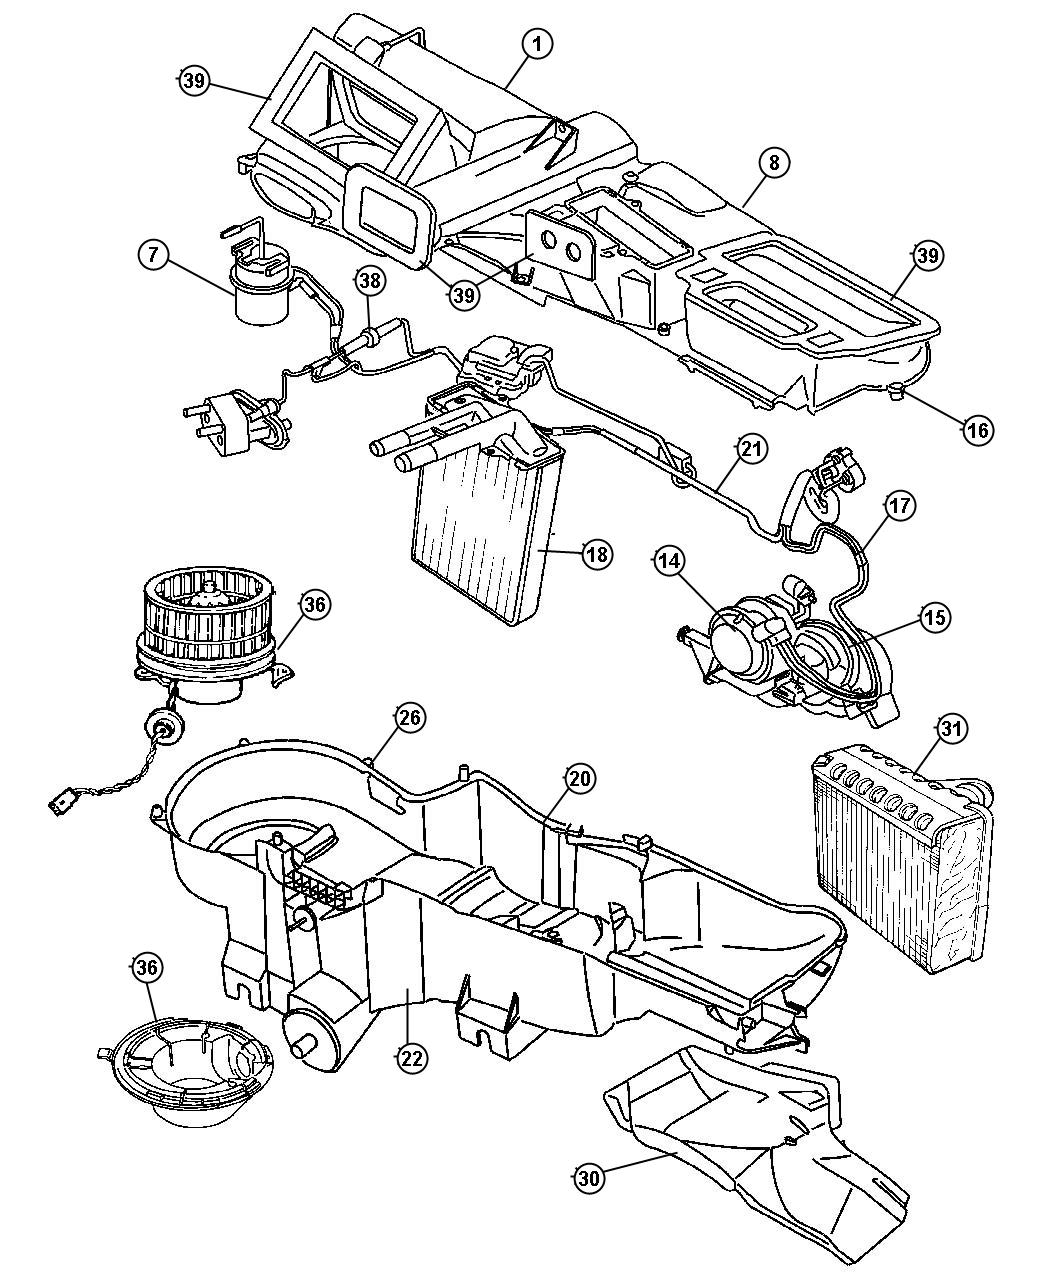 2005 jeep liberty core  heater  heater kit  heater core